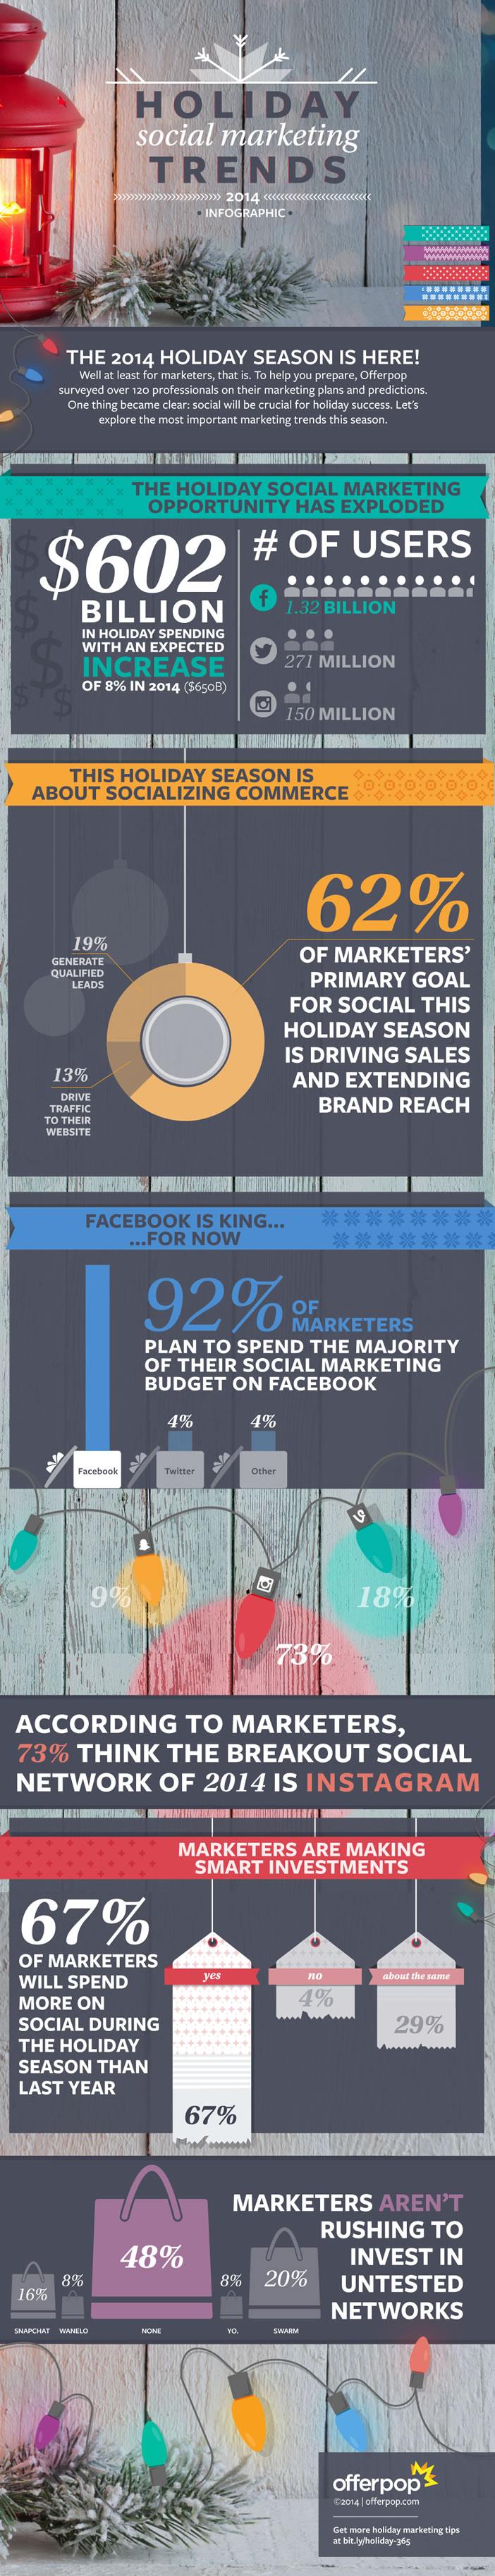 Infographie - Social media marketing pour Noël 2014